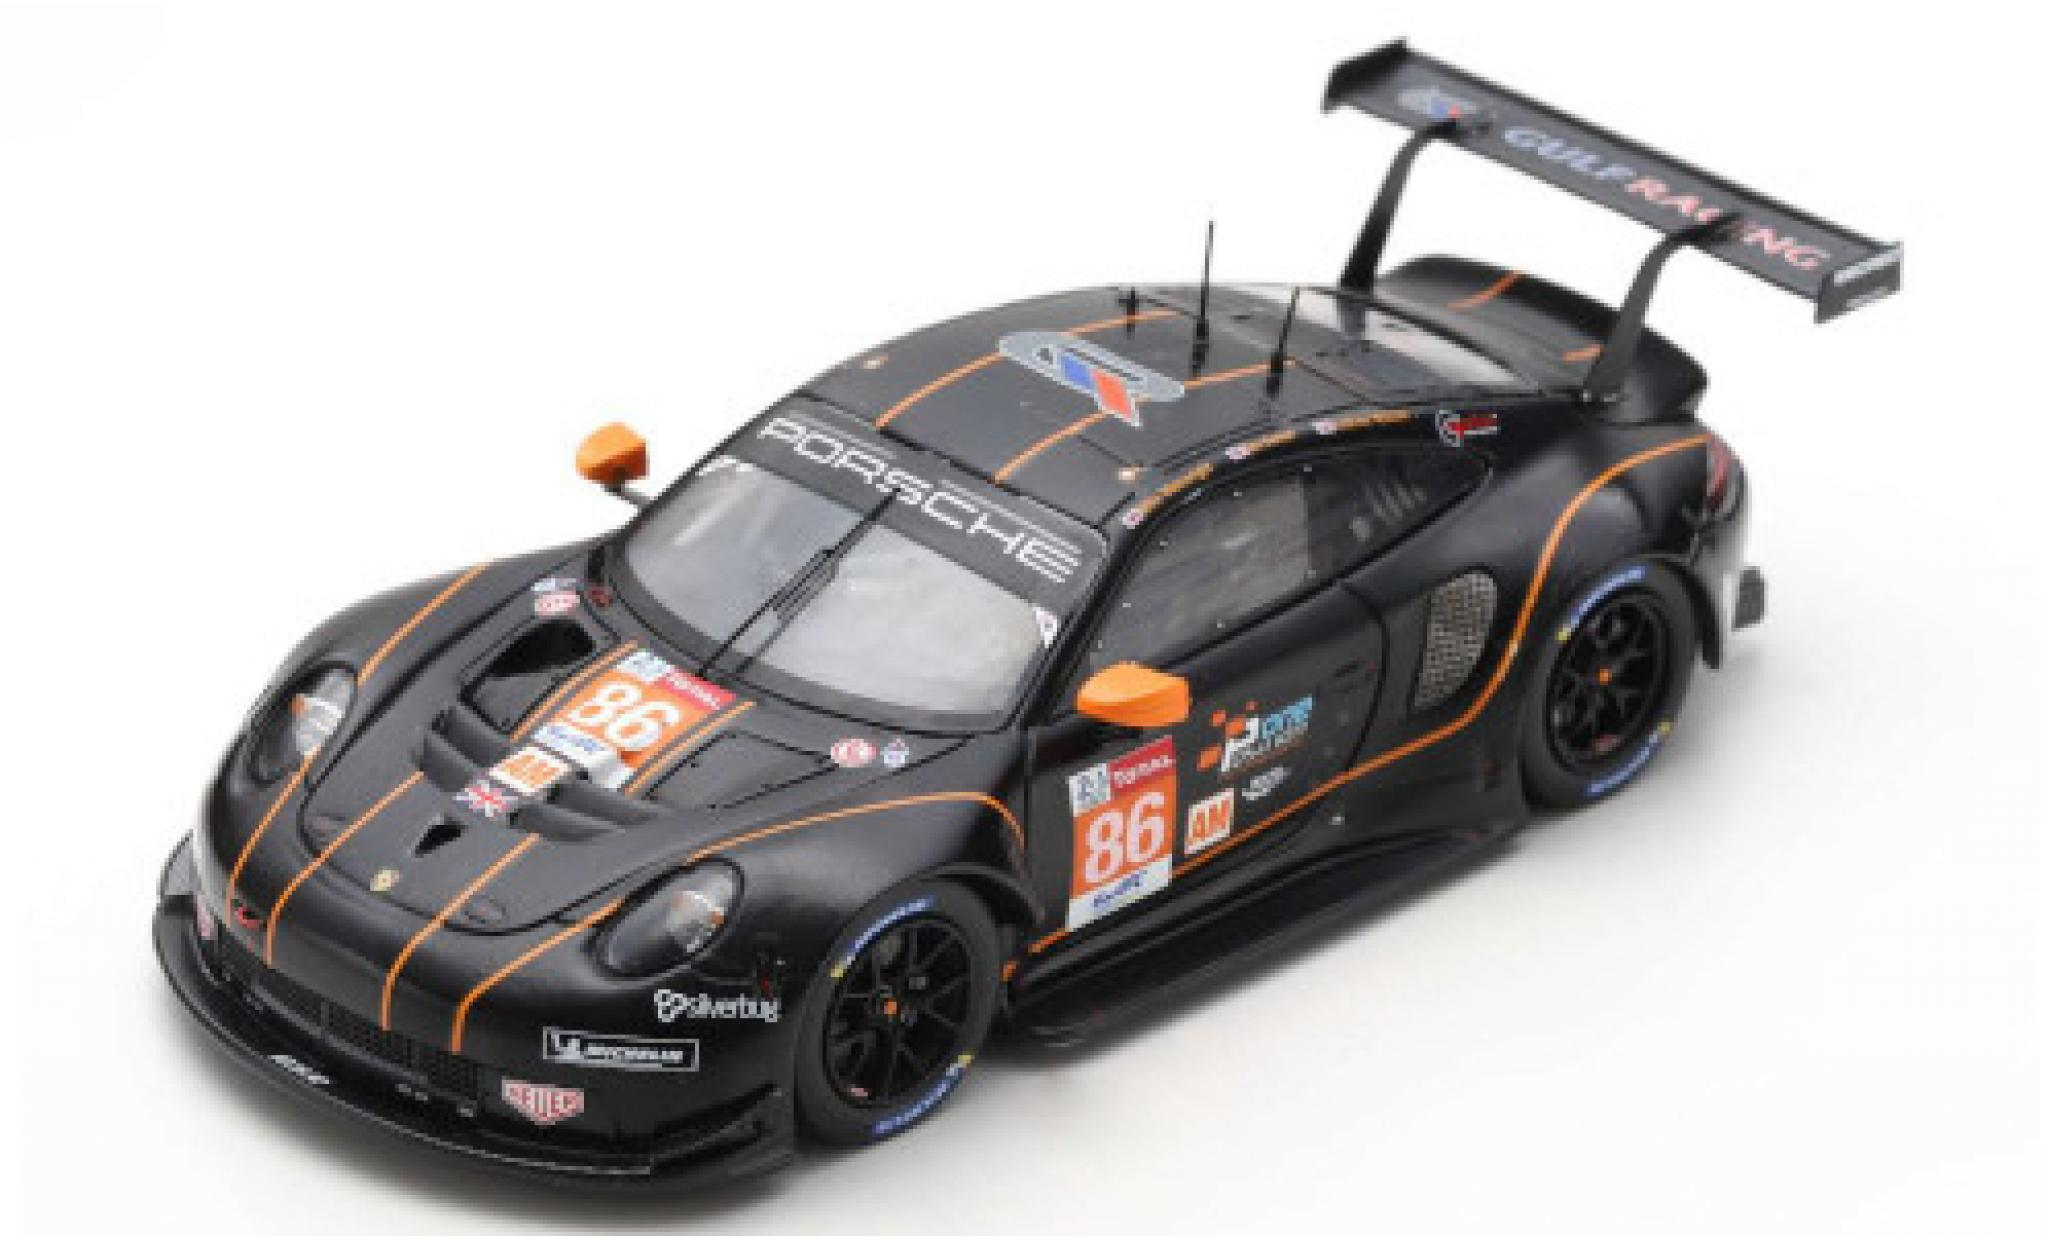 Porsche 992 RSR 1/43 Spark 911 No.86 Gulf Racing 24h Le Mans 2020 B.Barker/M.Wainwright/A.Watson